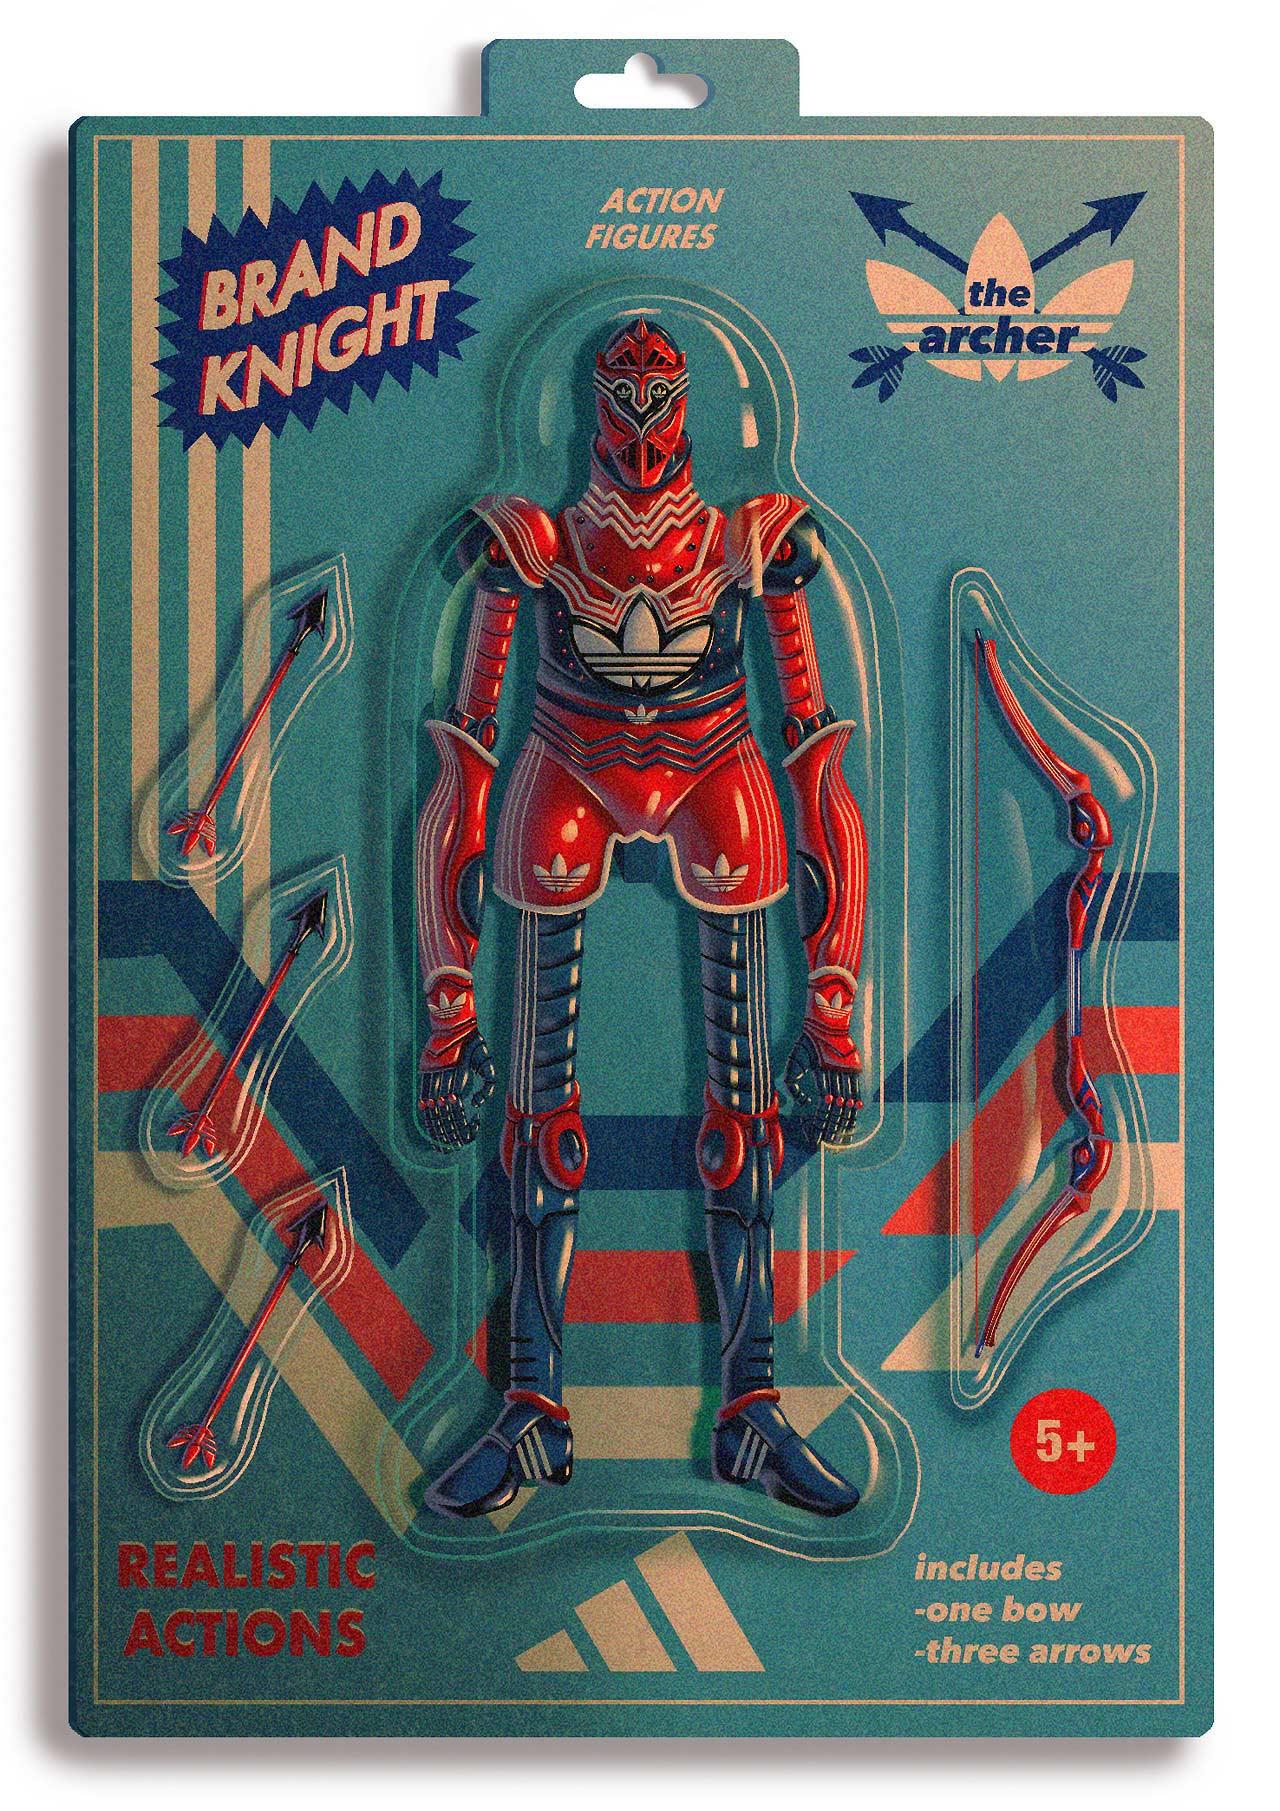 Brand Knights brand-knights_02